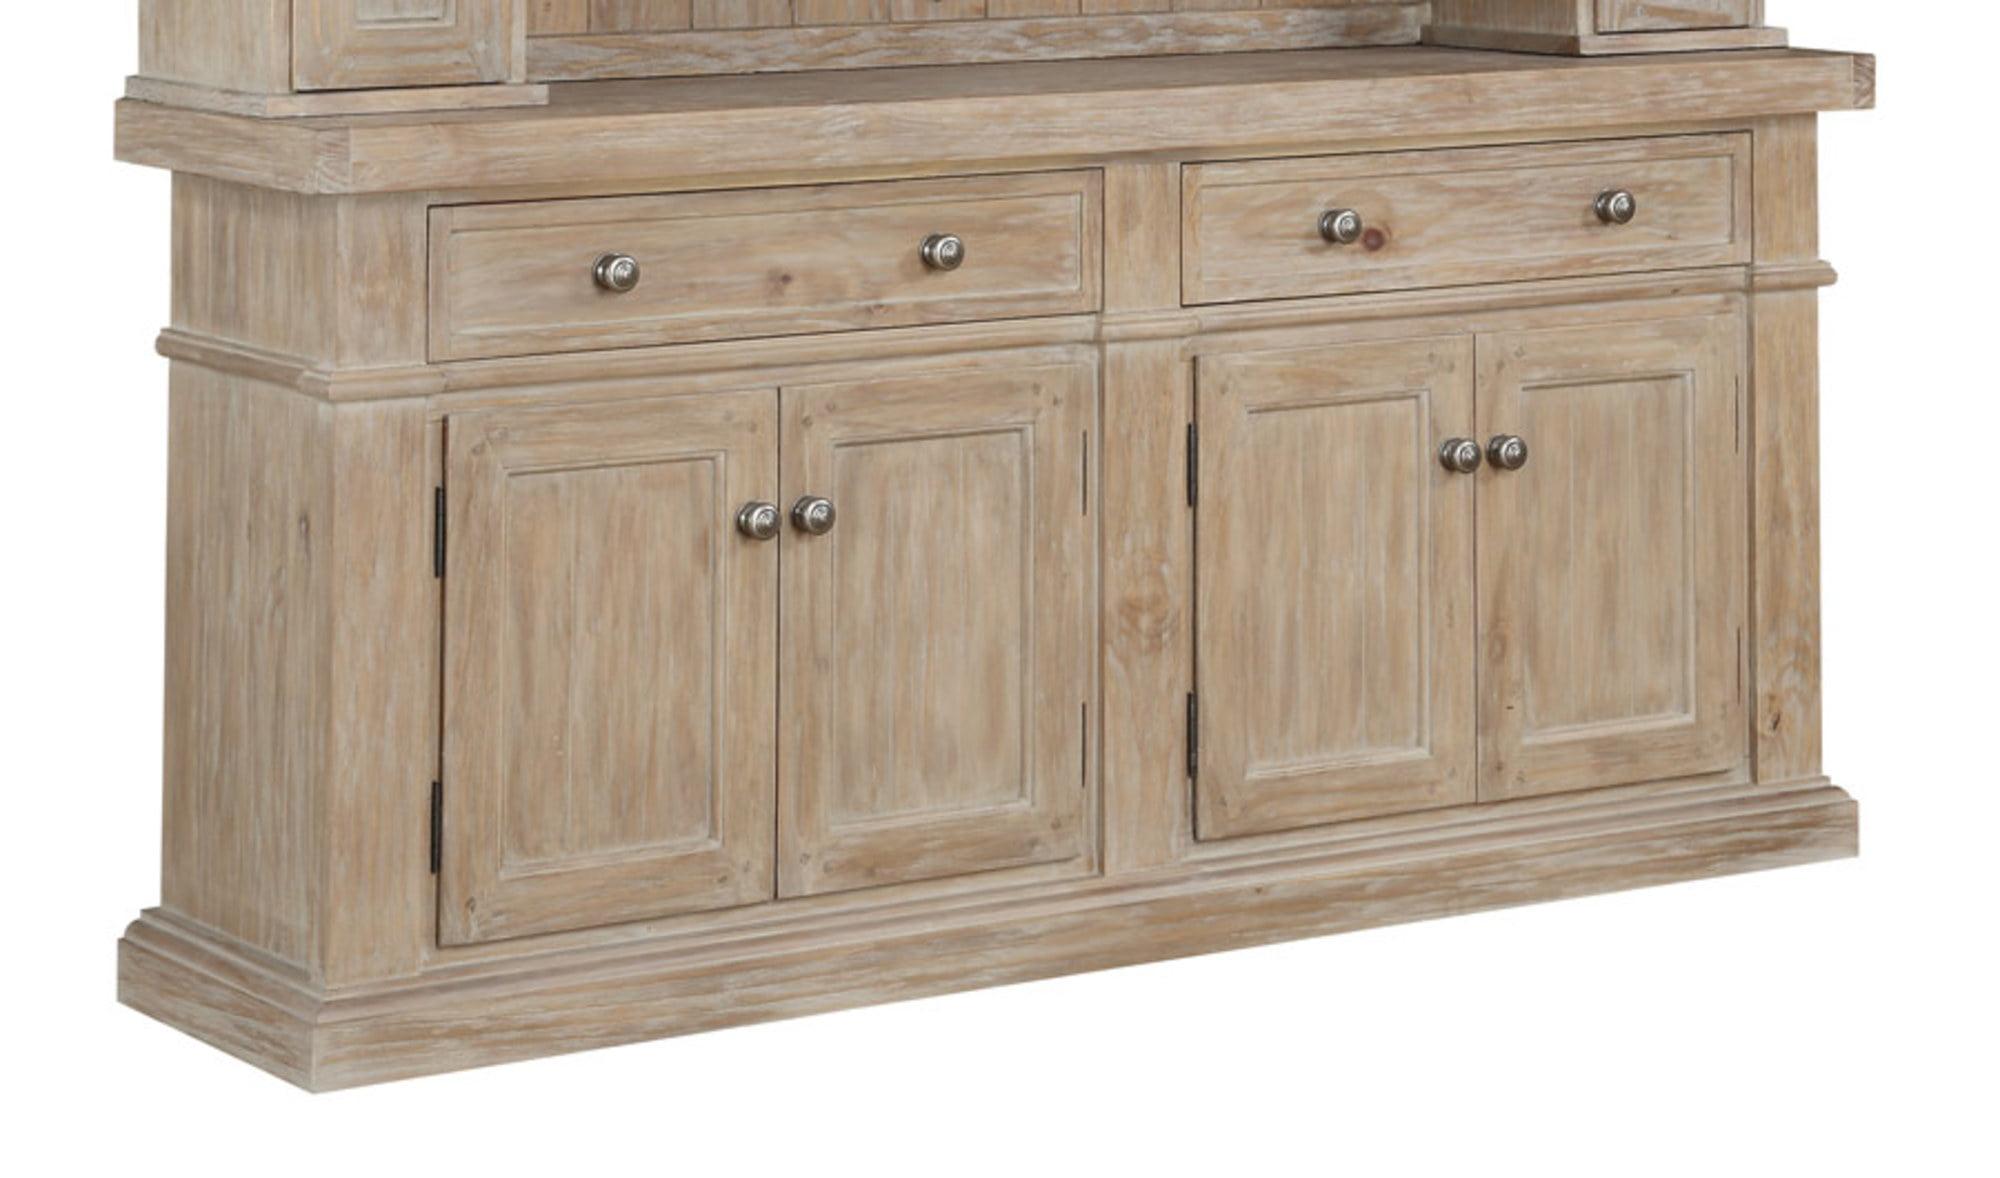 Emerald Home Castle Bay Buffet Pine D952-60 by Emerald Home Furnishings, LLC